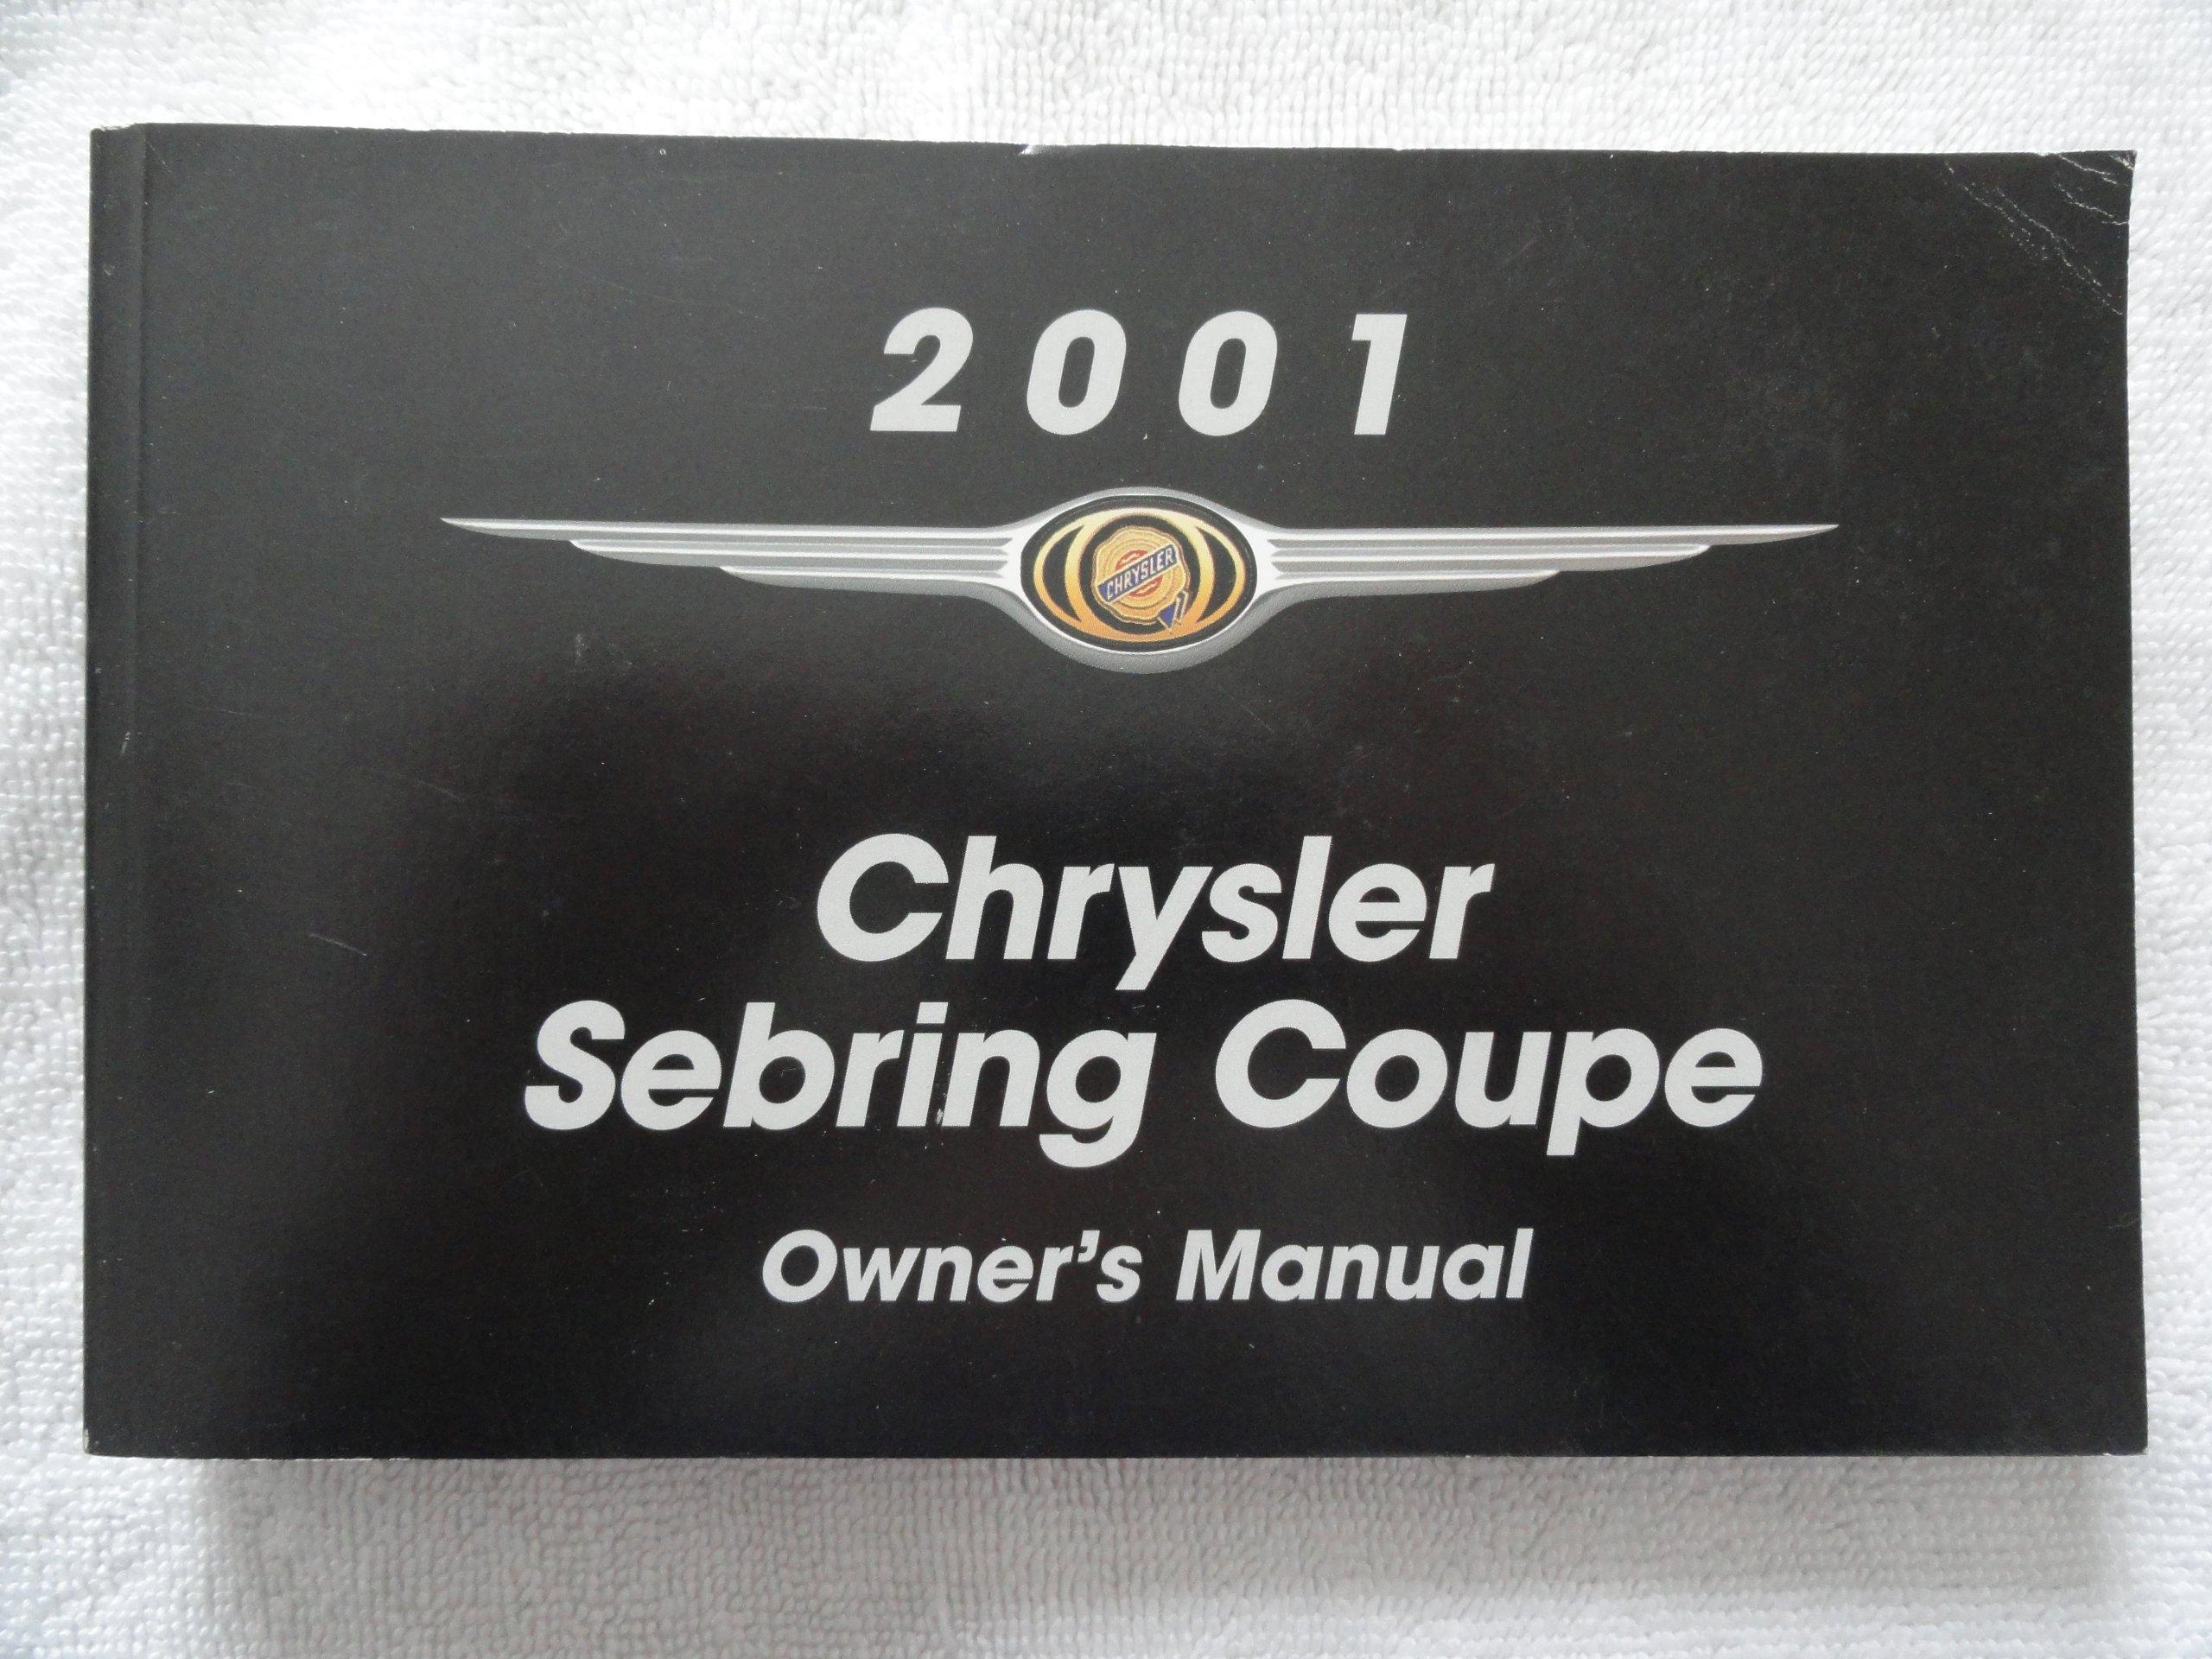 2001 chrysler sebring coupe owners manual chrysler amazon com books rh amazon com